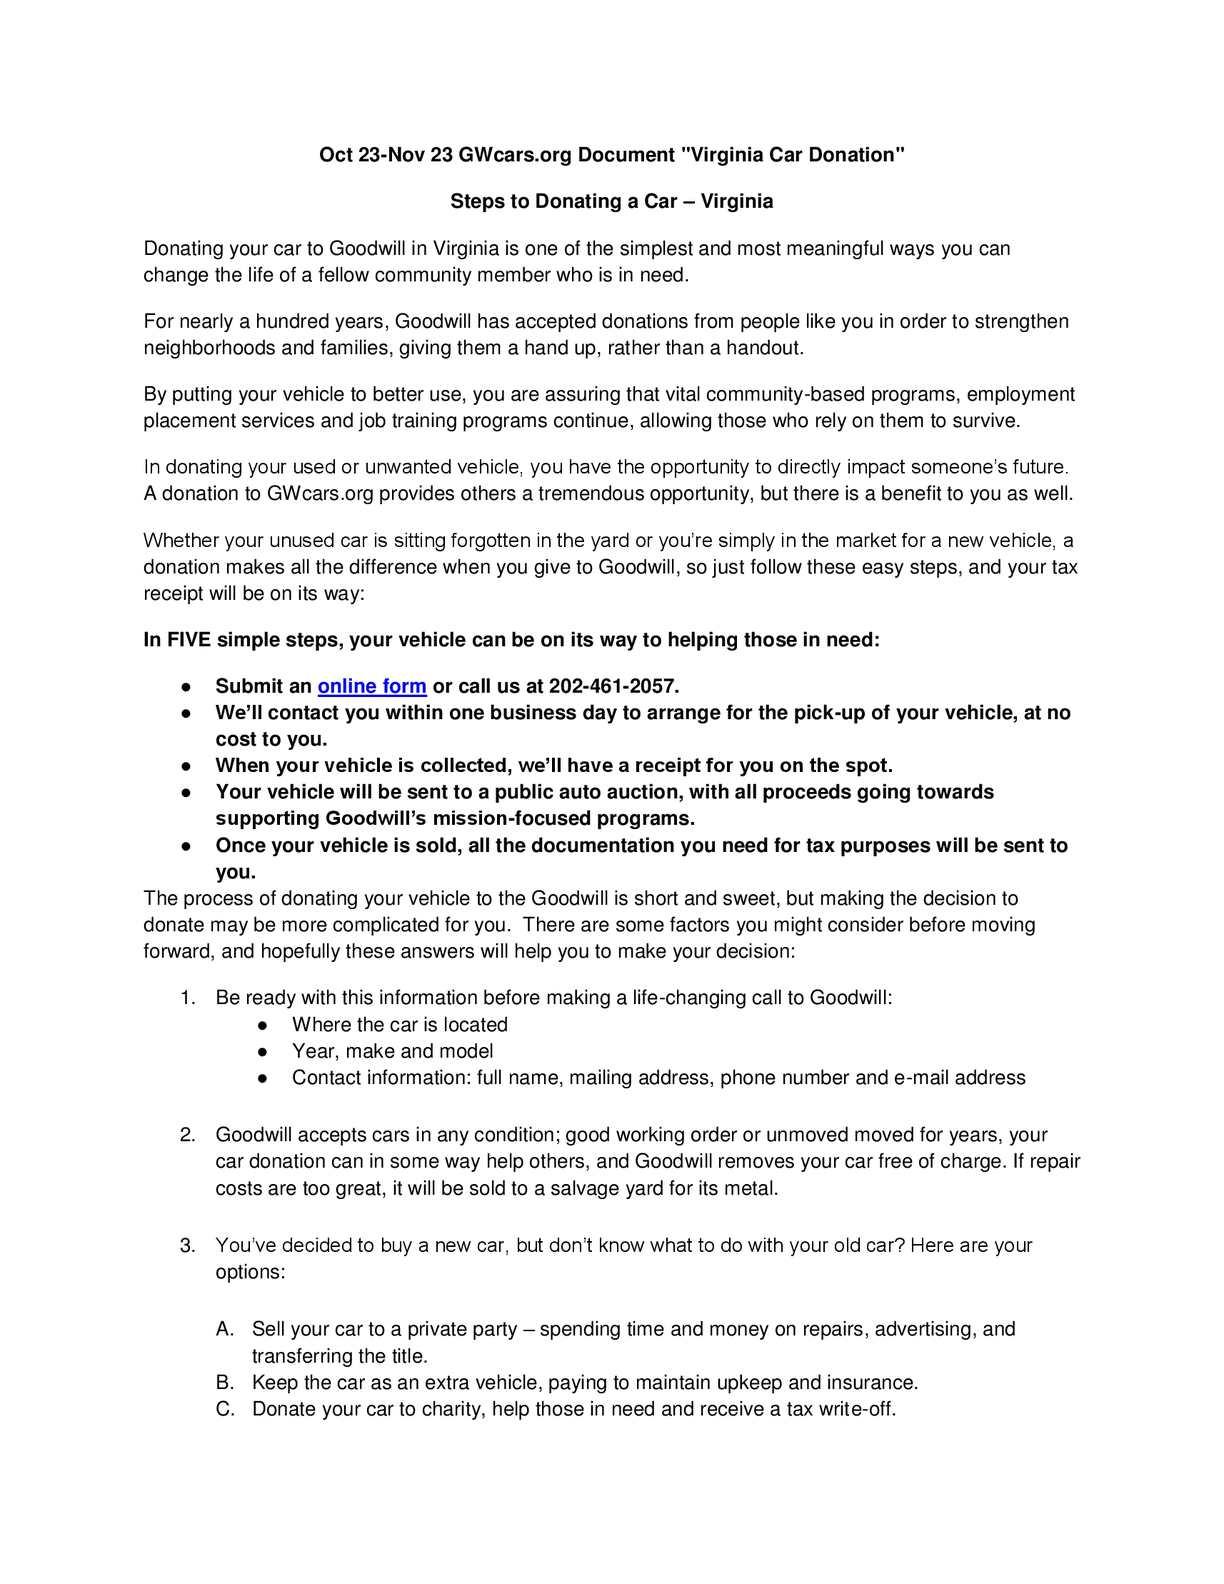 Virginia Car Tax >> Calameo Steps To Donating A Car Virginia